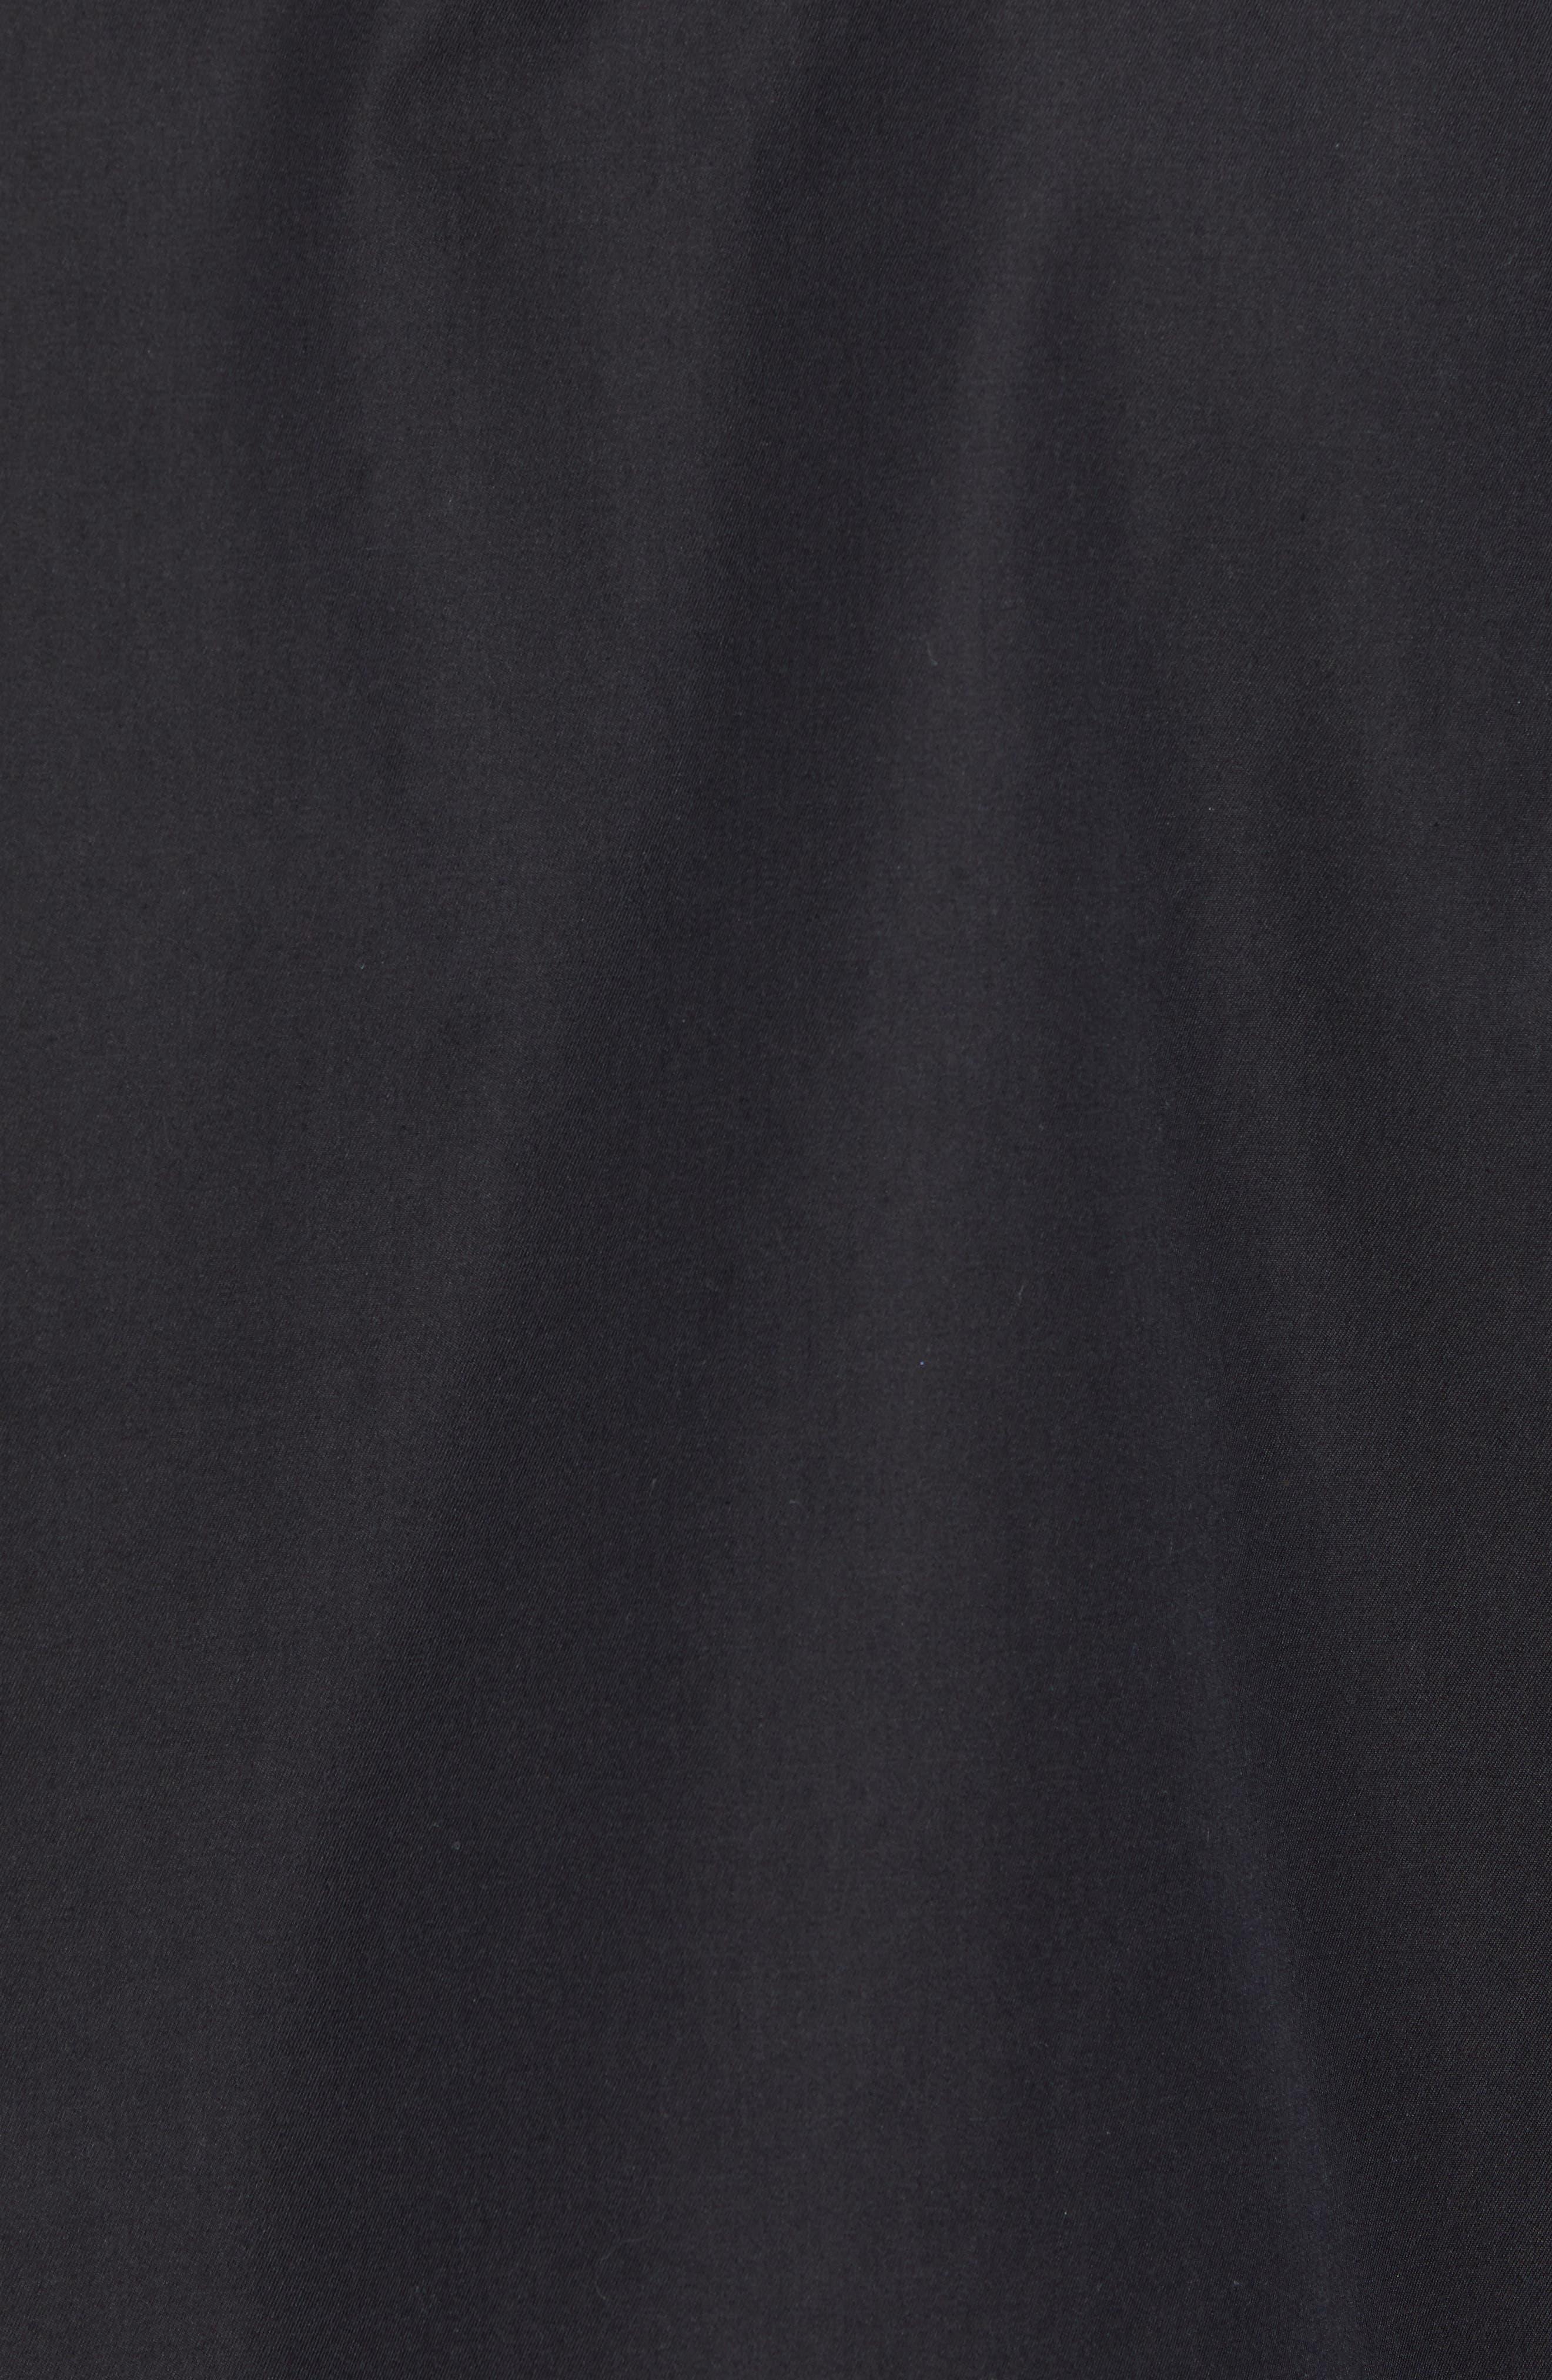 Regular Fit Jacket,                             Alternate thumbnail 5, color,                             Black